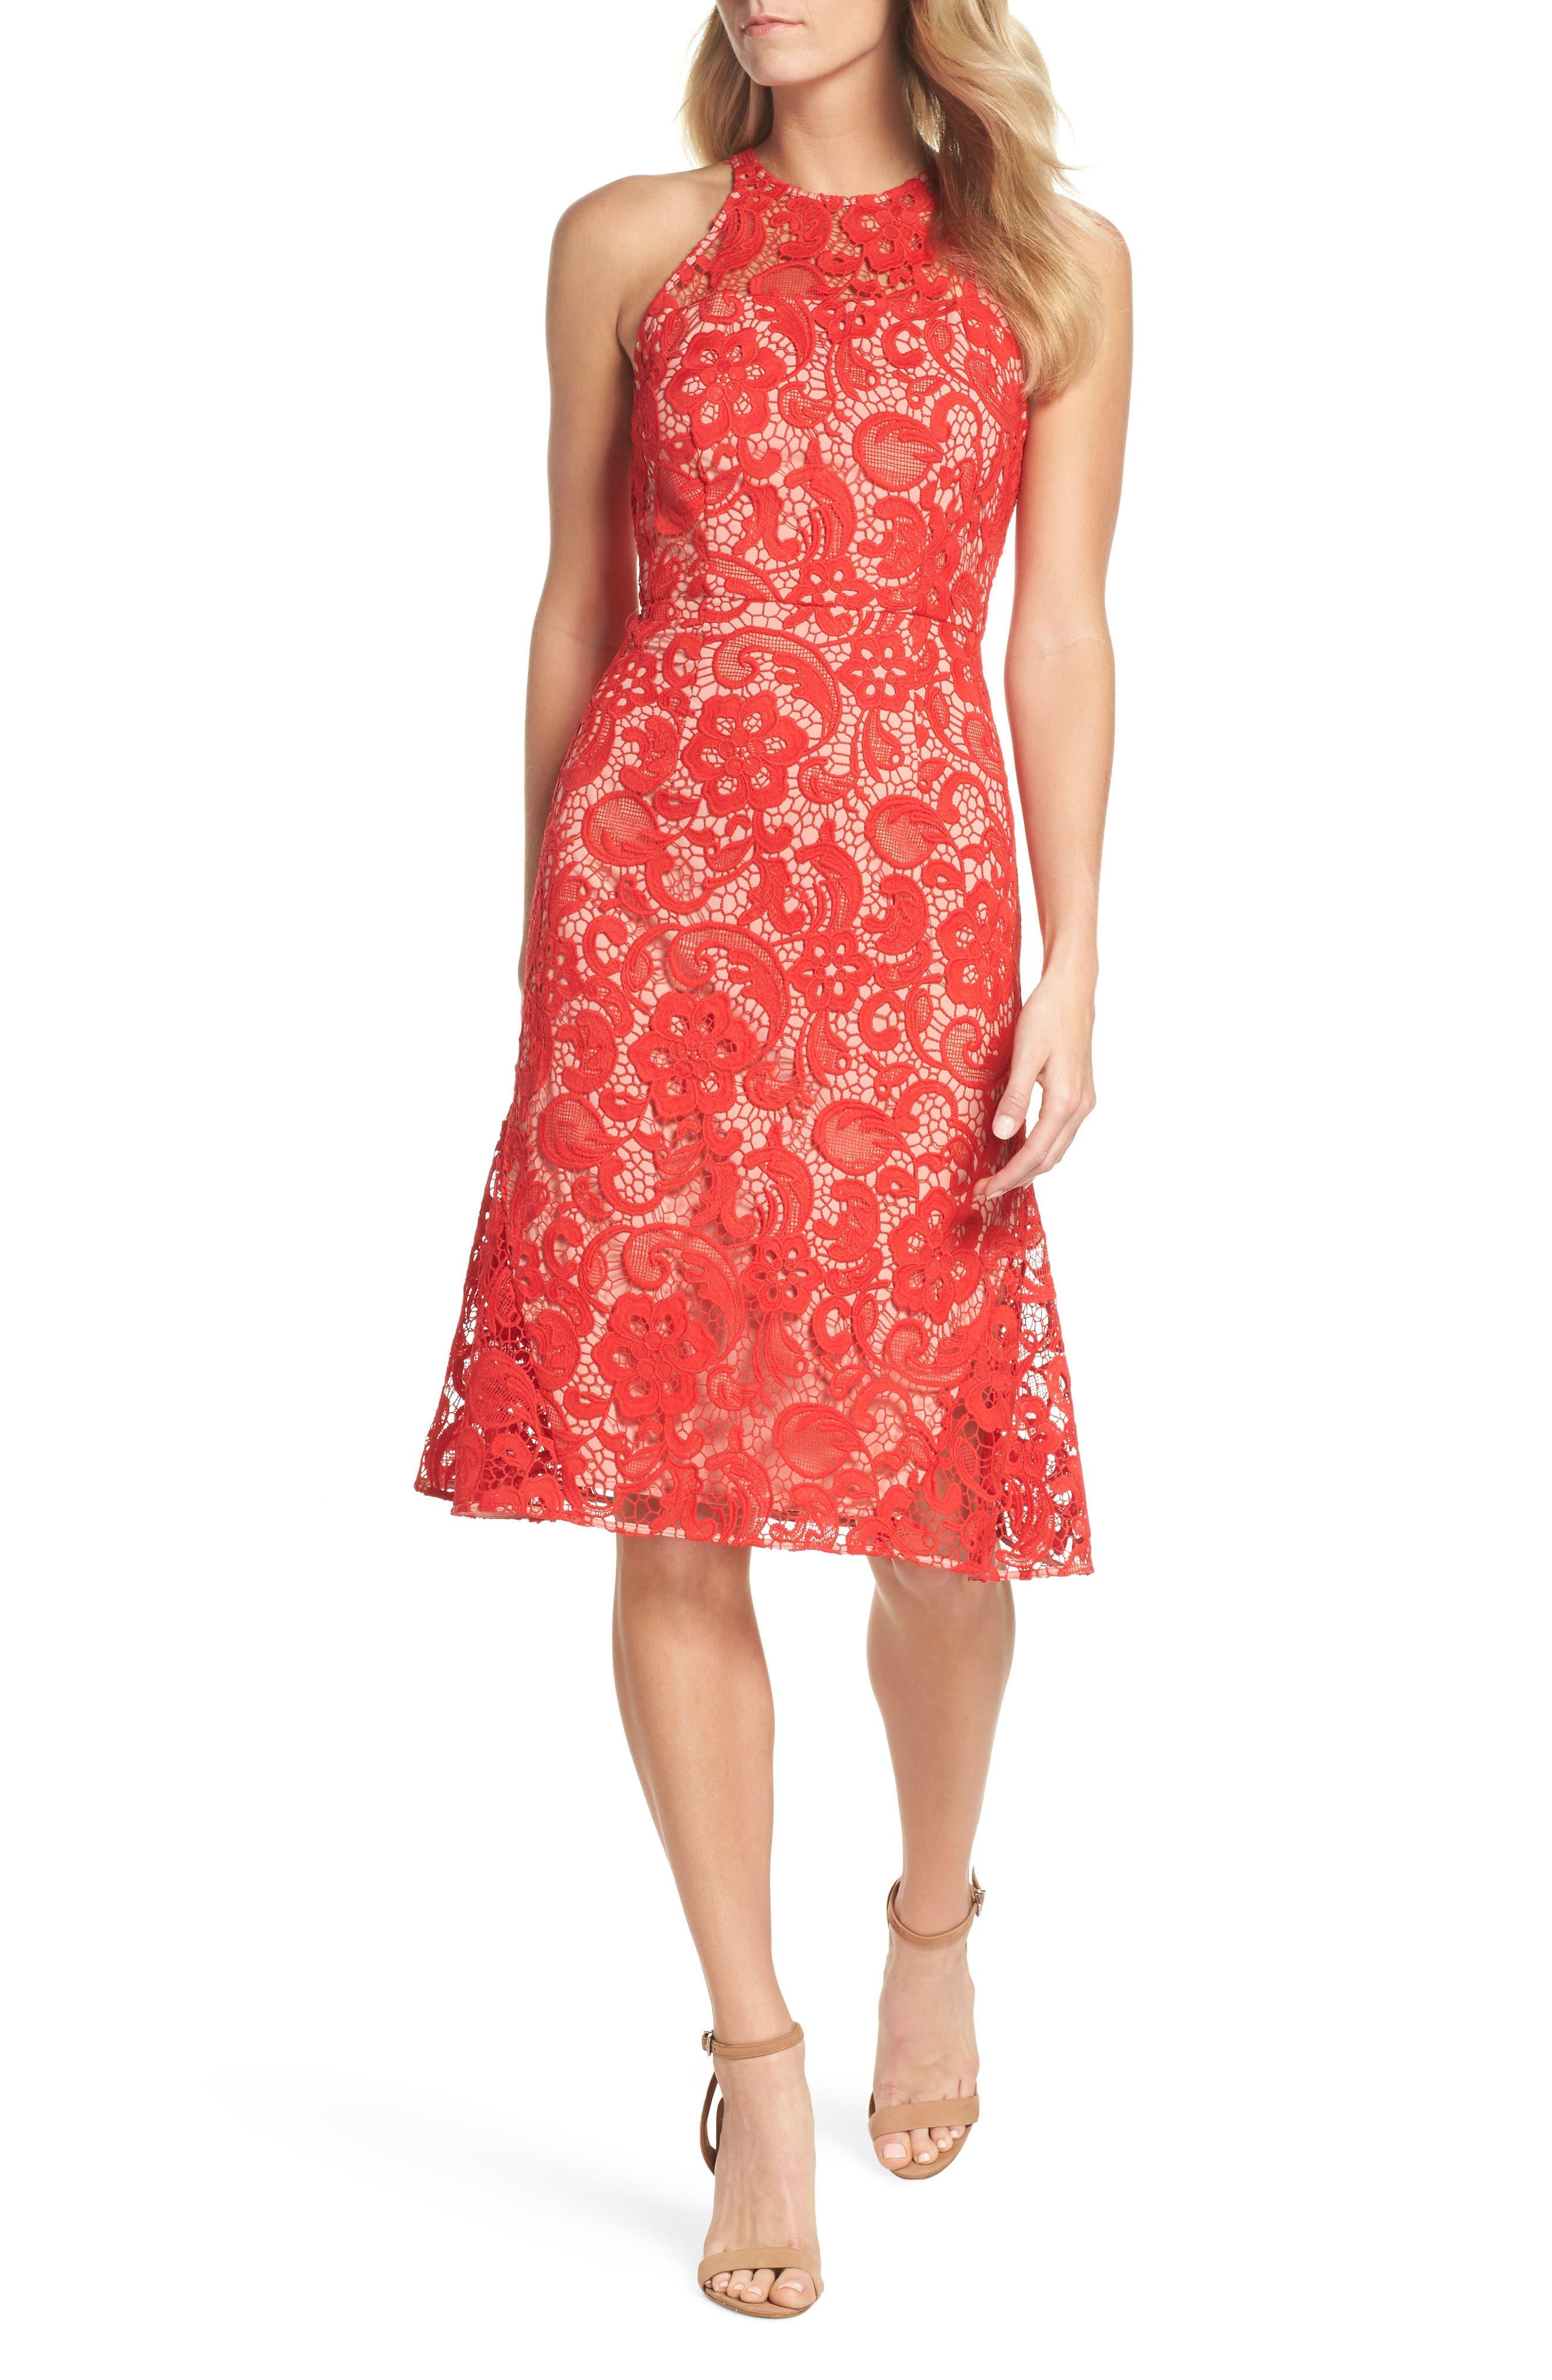 Carnation Lace Dress,                         Main,                         color, 600